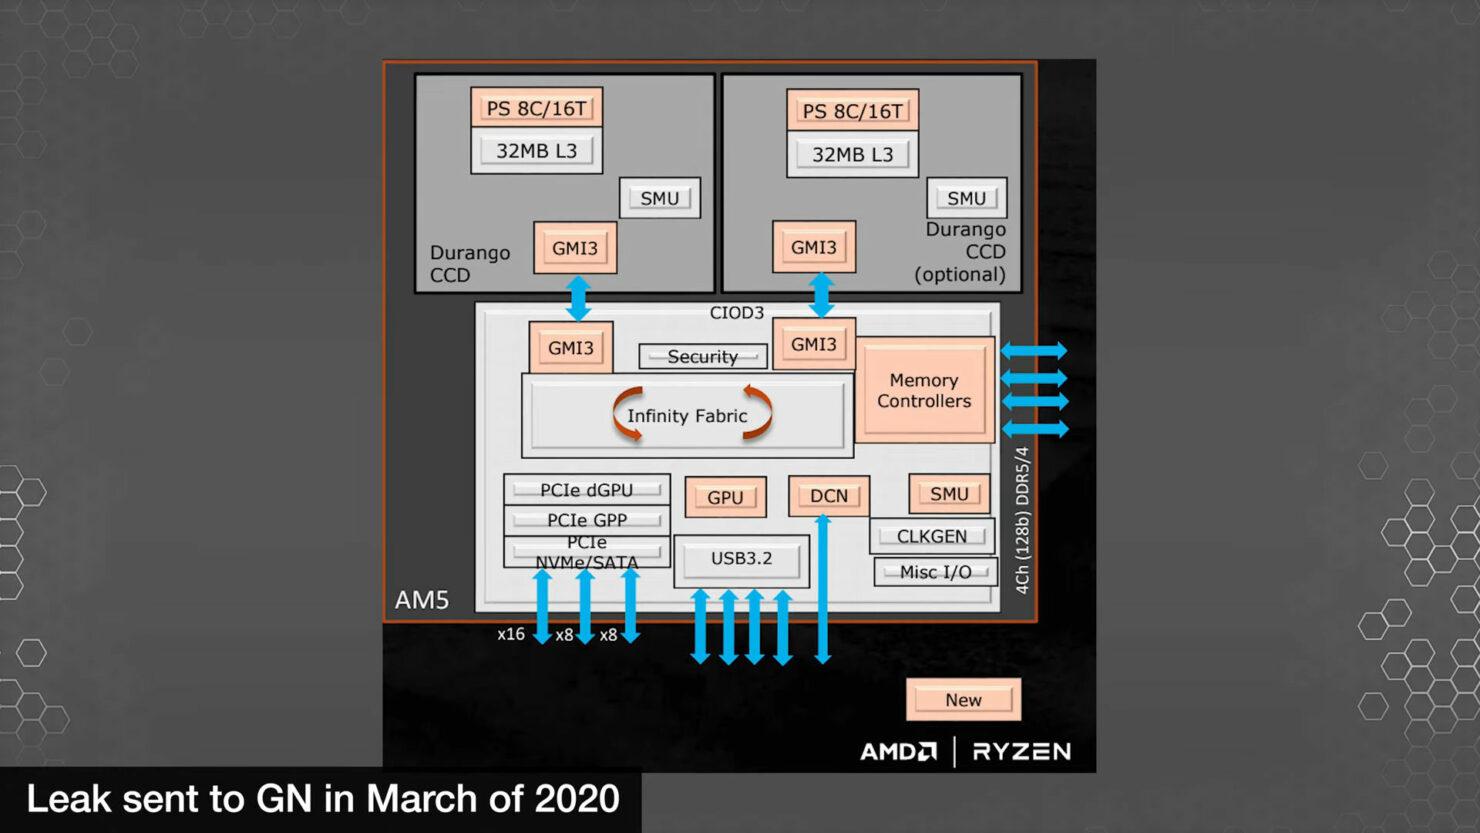 amd-ryzen-raphael-zen-4-desktop-cpu-am5-platform-details-leak_-old-slides-_2020-_2